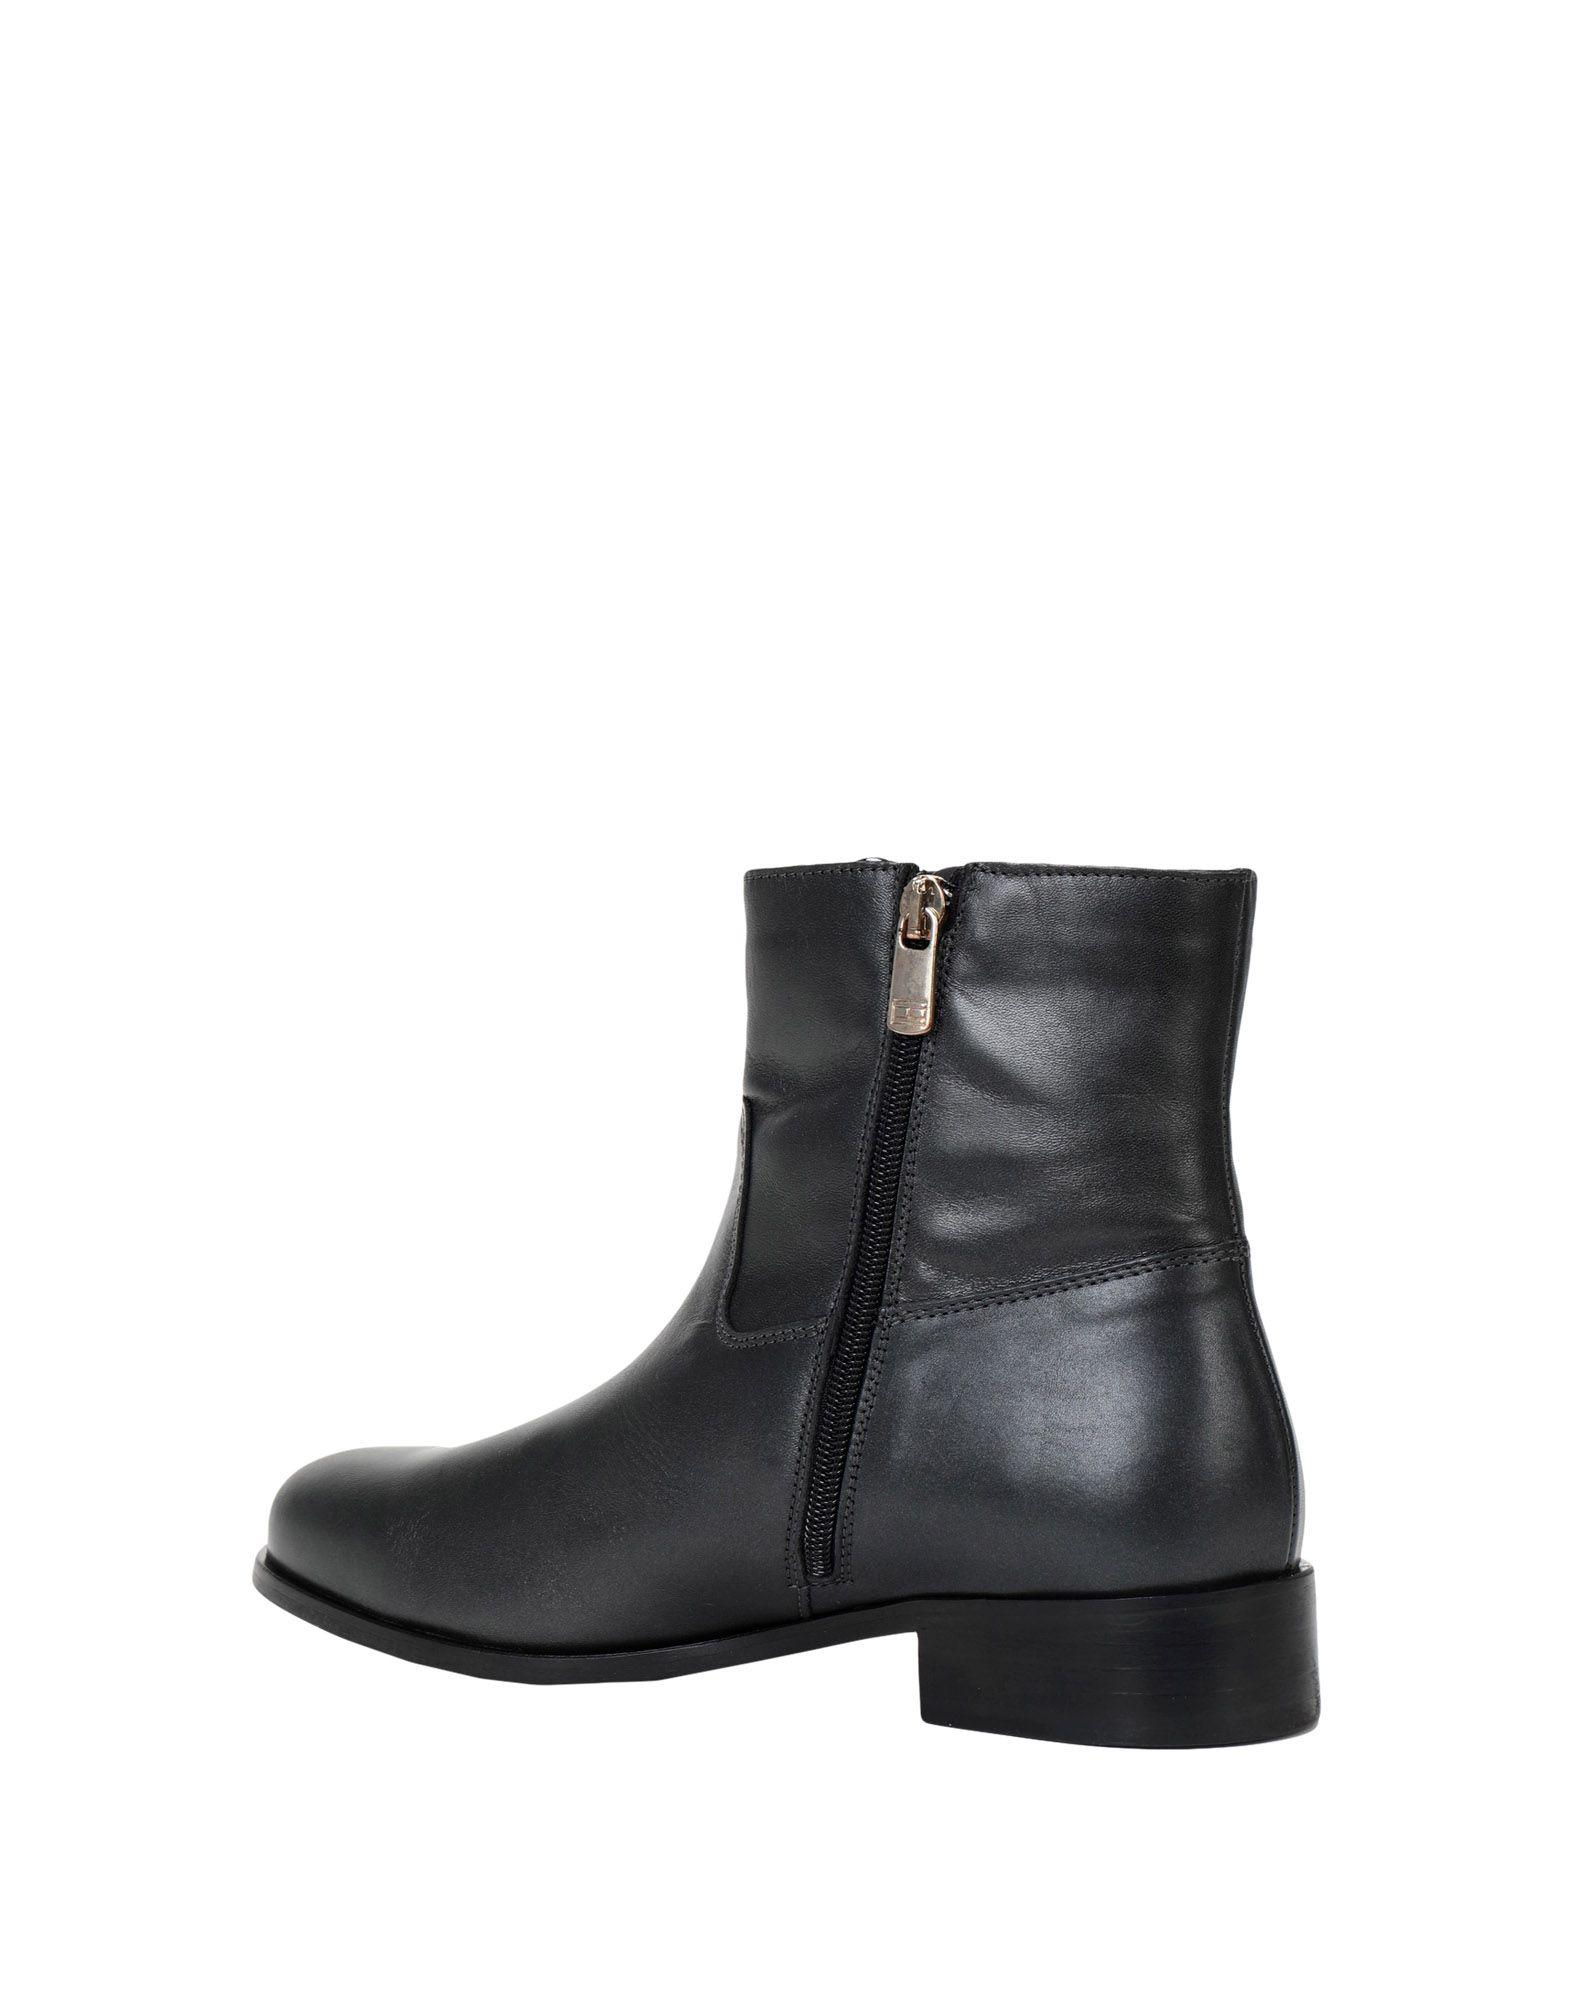 Stilvolle billige Schuhe Tommy Hilfiger  Chain Detail Flat Boot  Hilfiger 11539398HK 4a6767